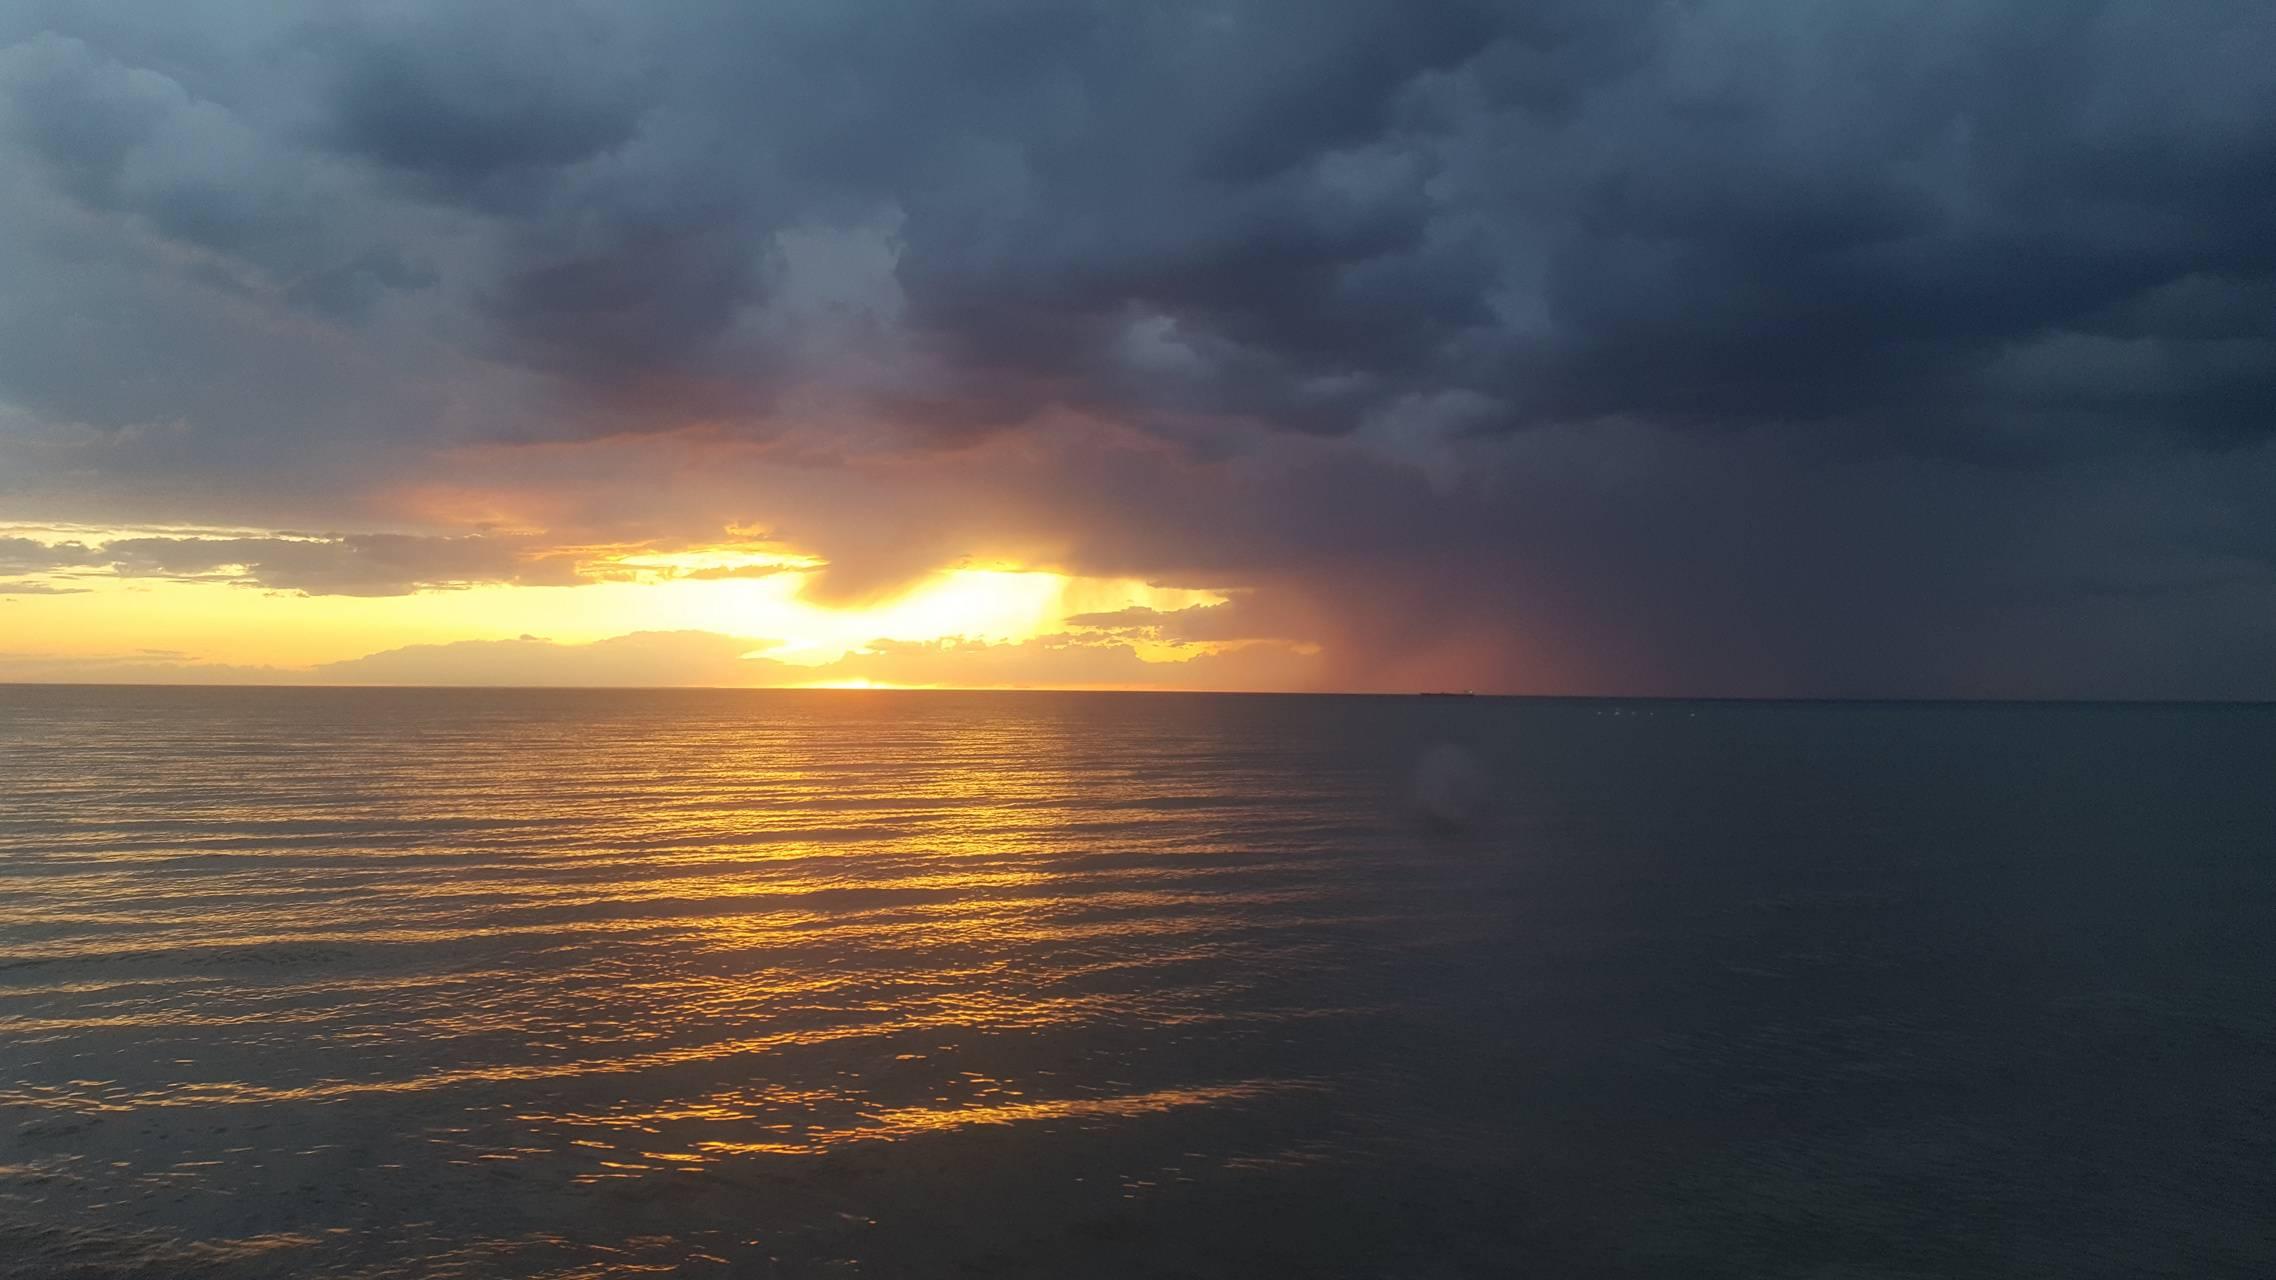 Light after storm